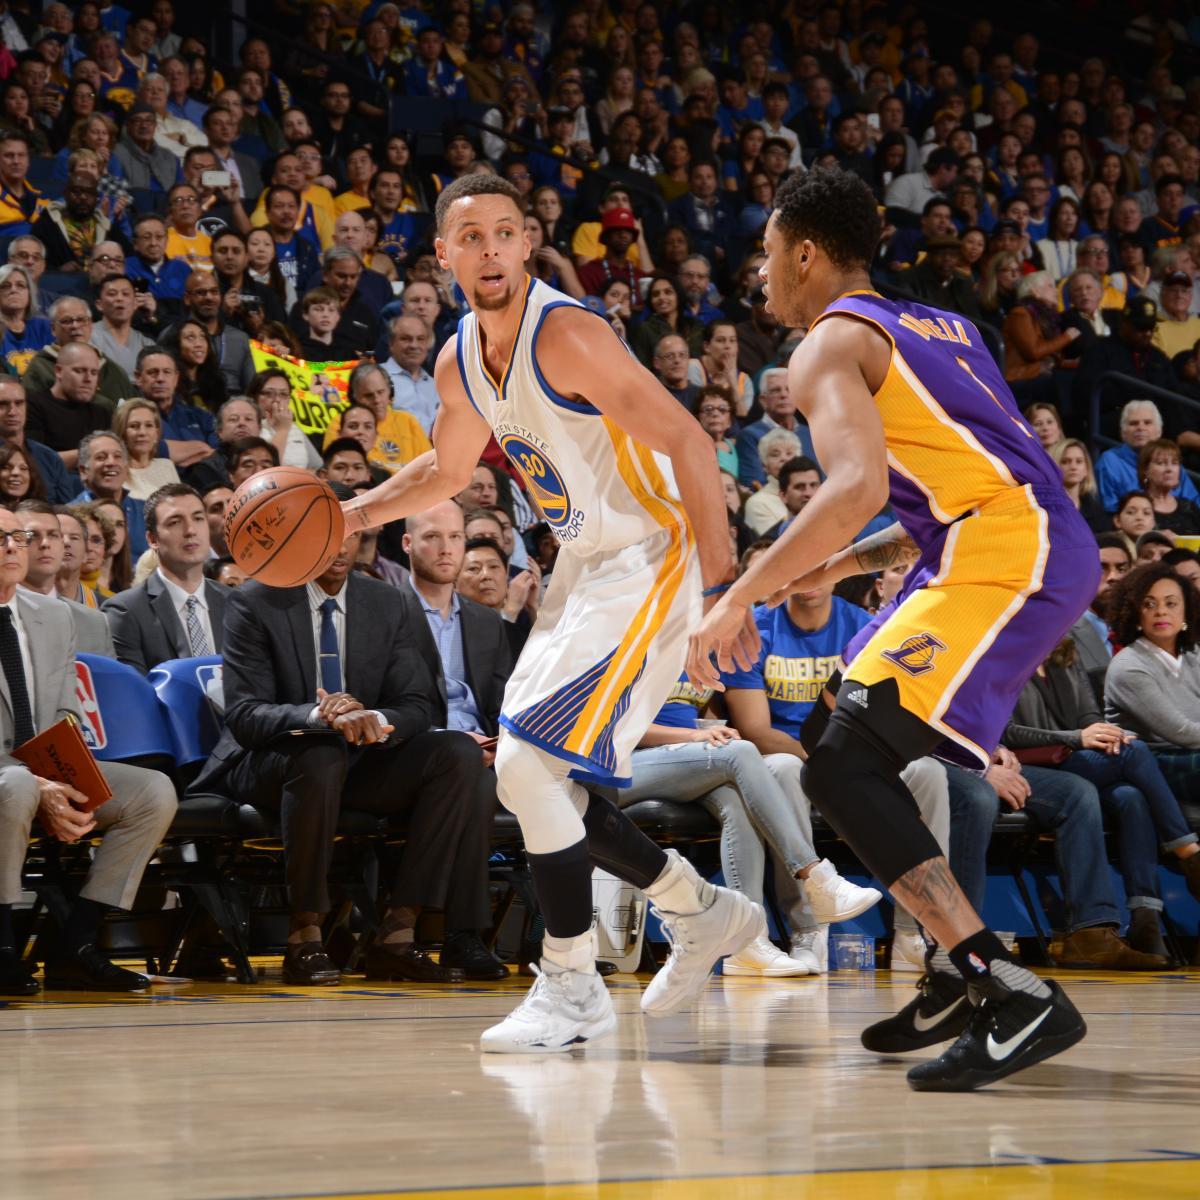 Lakers Vs. Warriors: Score, Video Highlights And Recap